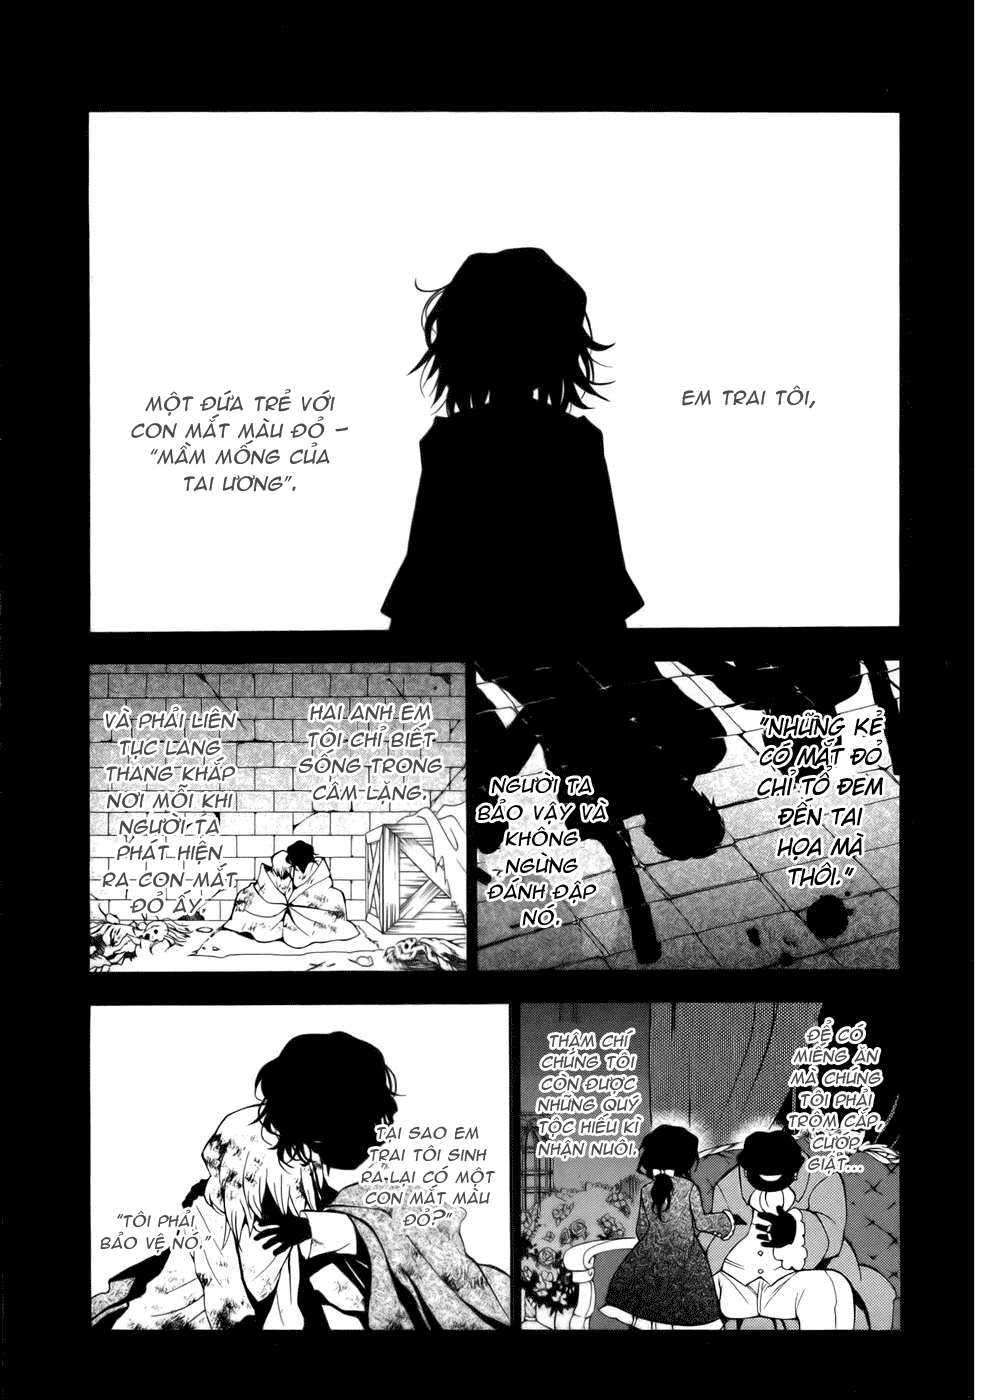 Pandora Hearts chương 038 - retrace - xxxviii scapegoat trang 2